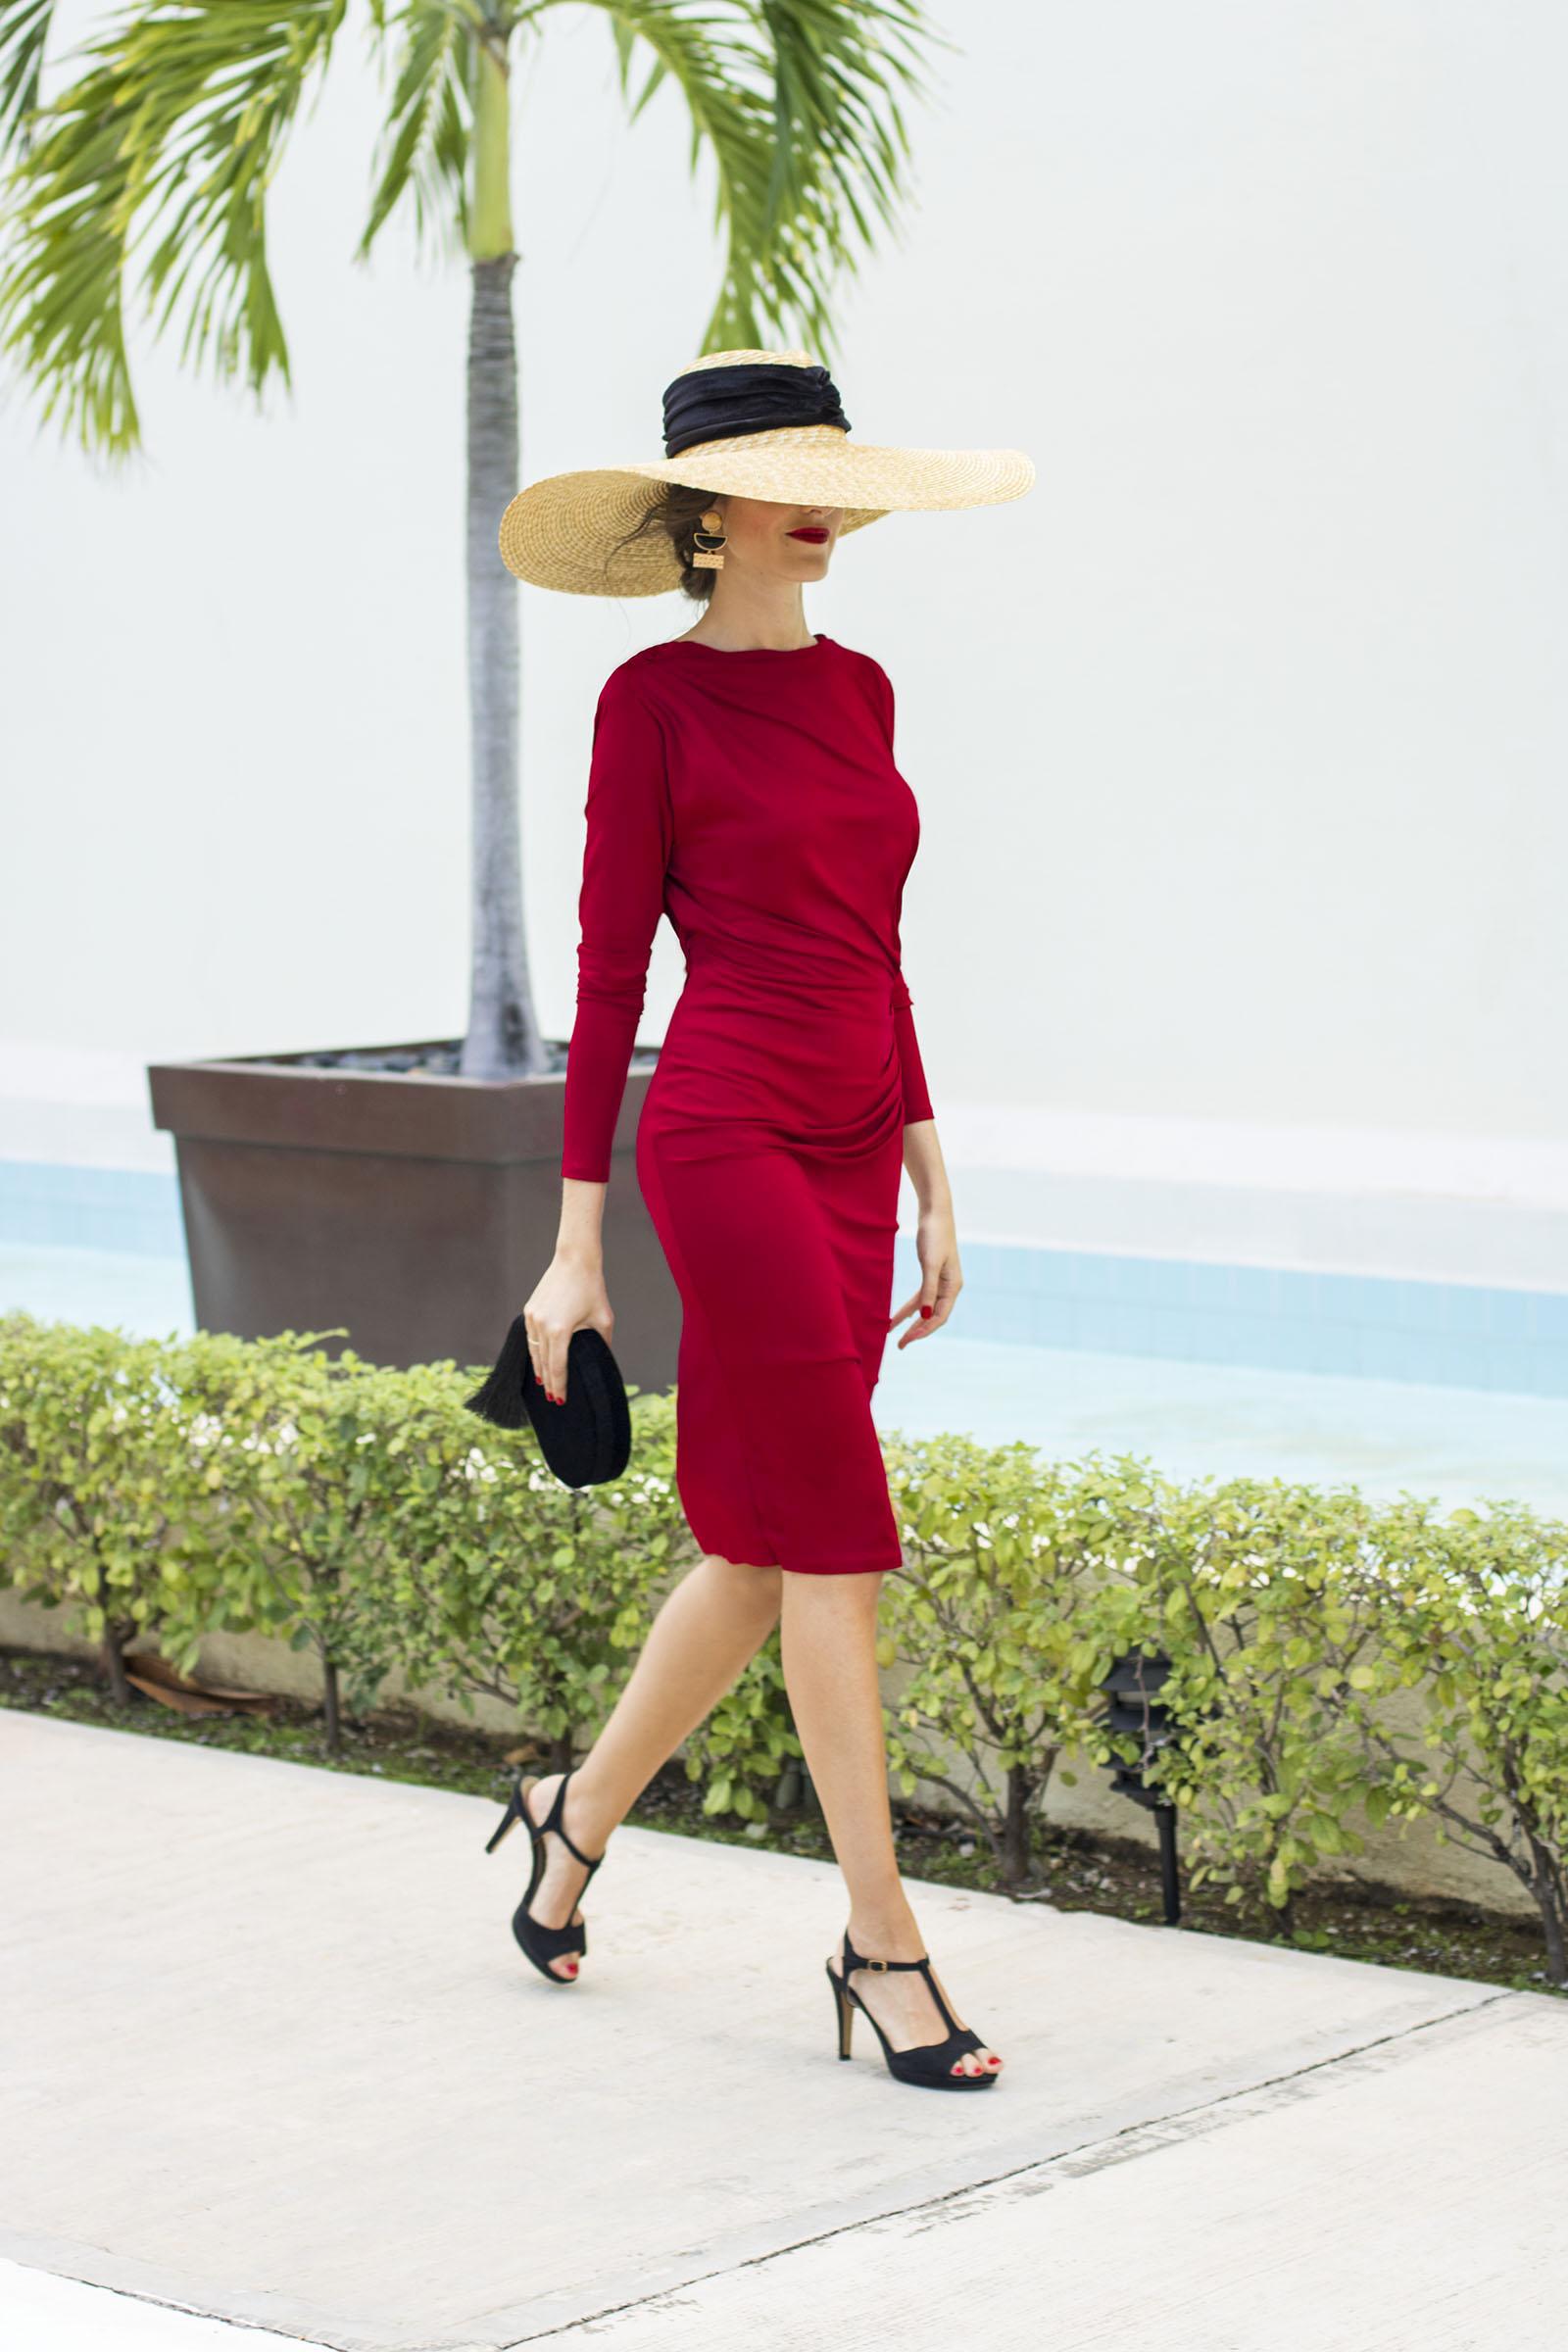 invitada-boda-wild-pony-rojo-y-masario-iberostar-cancun